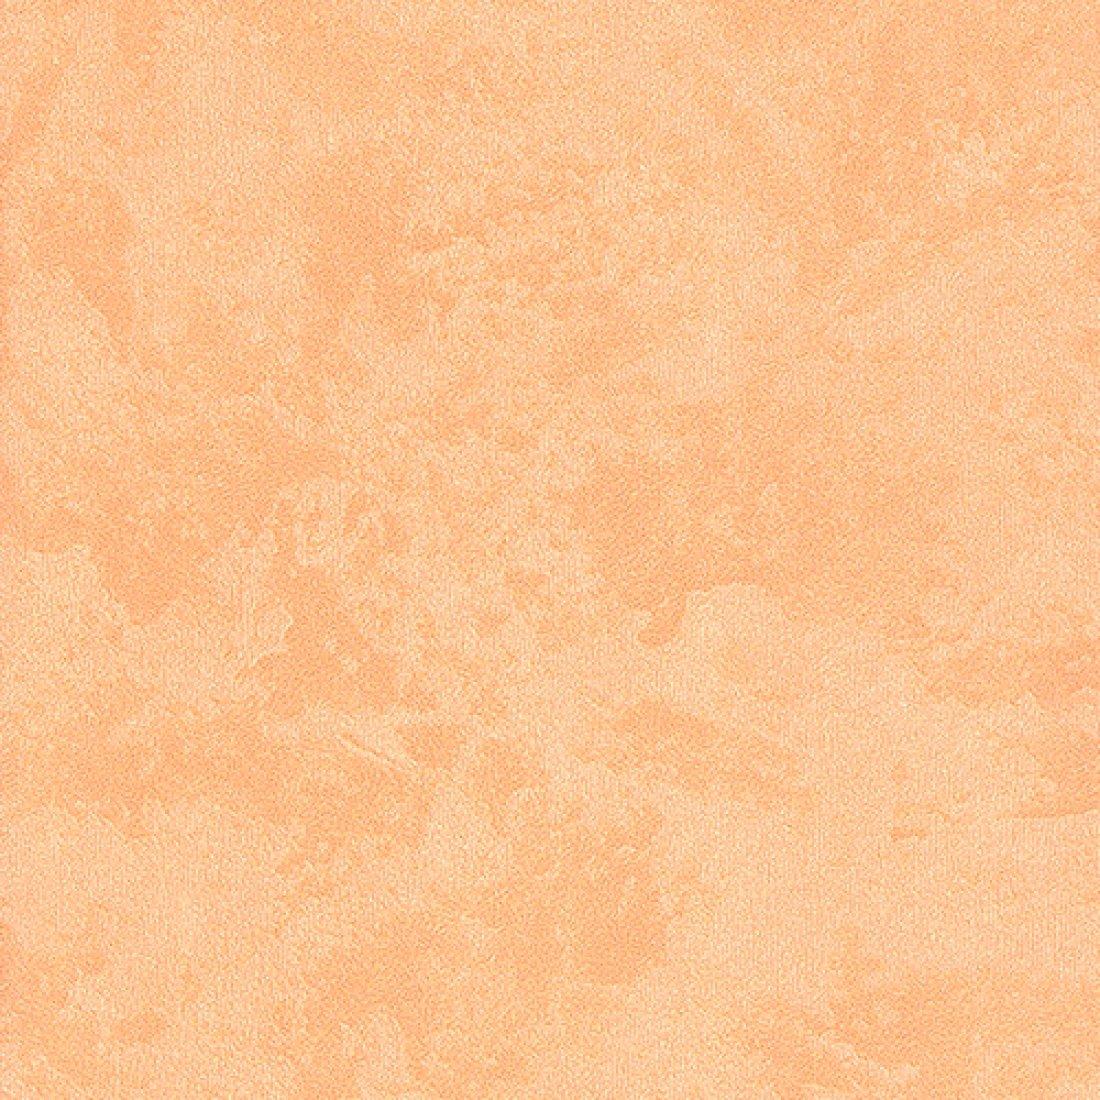 Обои из винила Limonta коллекции Di Seta , артикул 55714